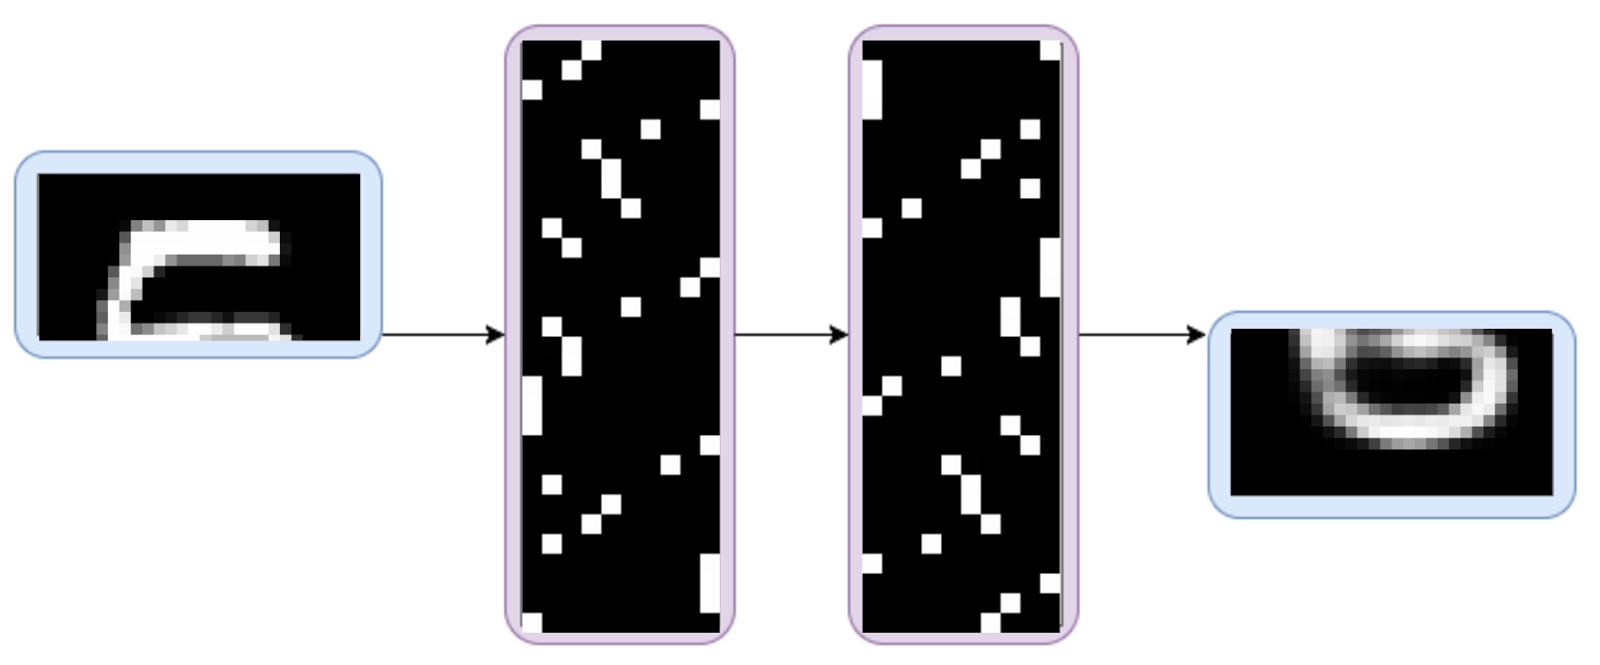 Eric Jang: Tutorial: Categorical Variational Autoencoders